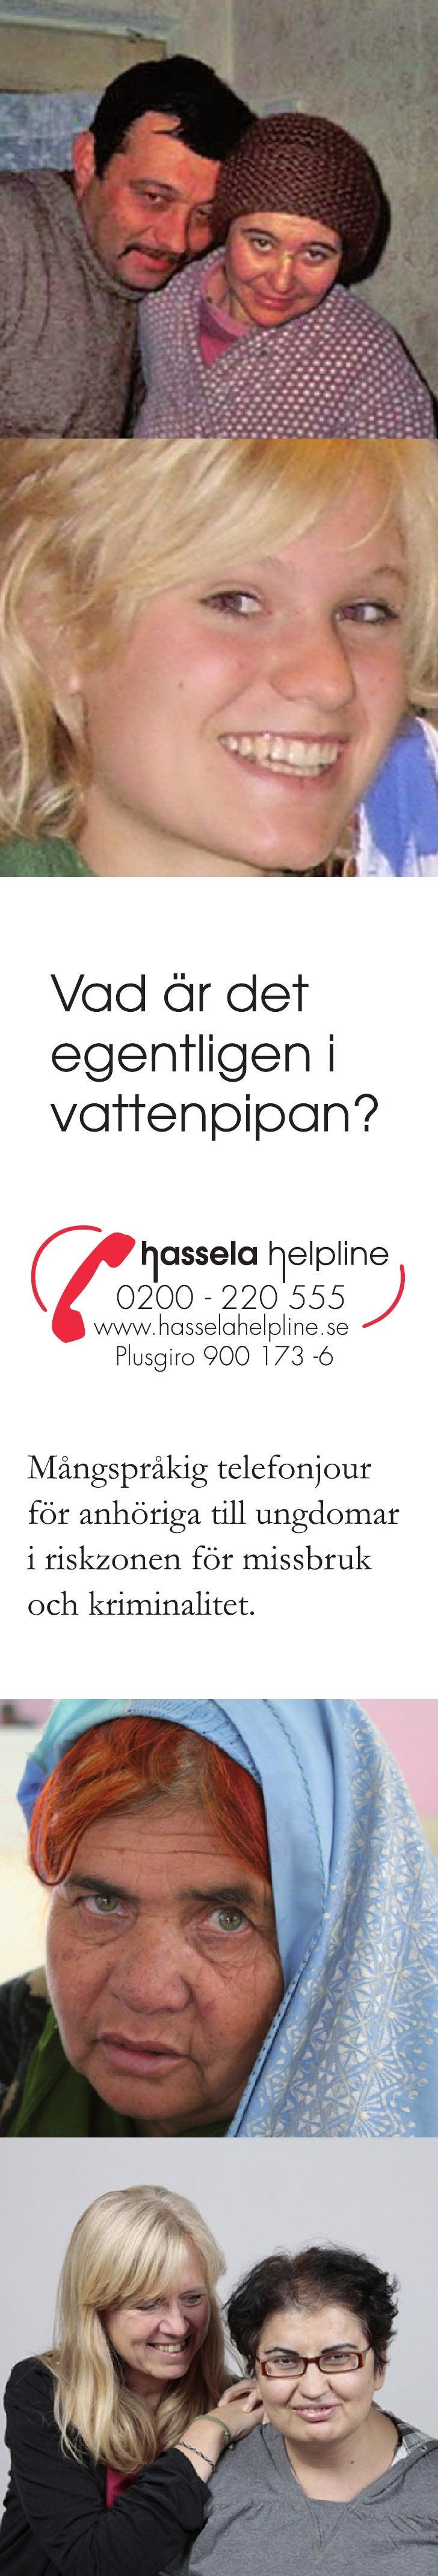 Hassela_Helpline-pluggannons_34x200.pdf